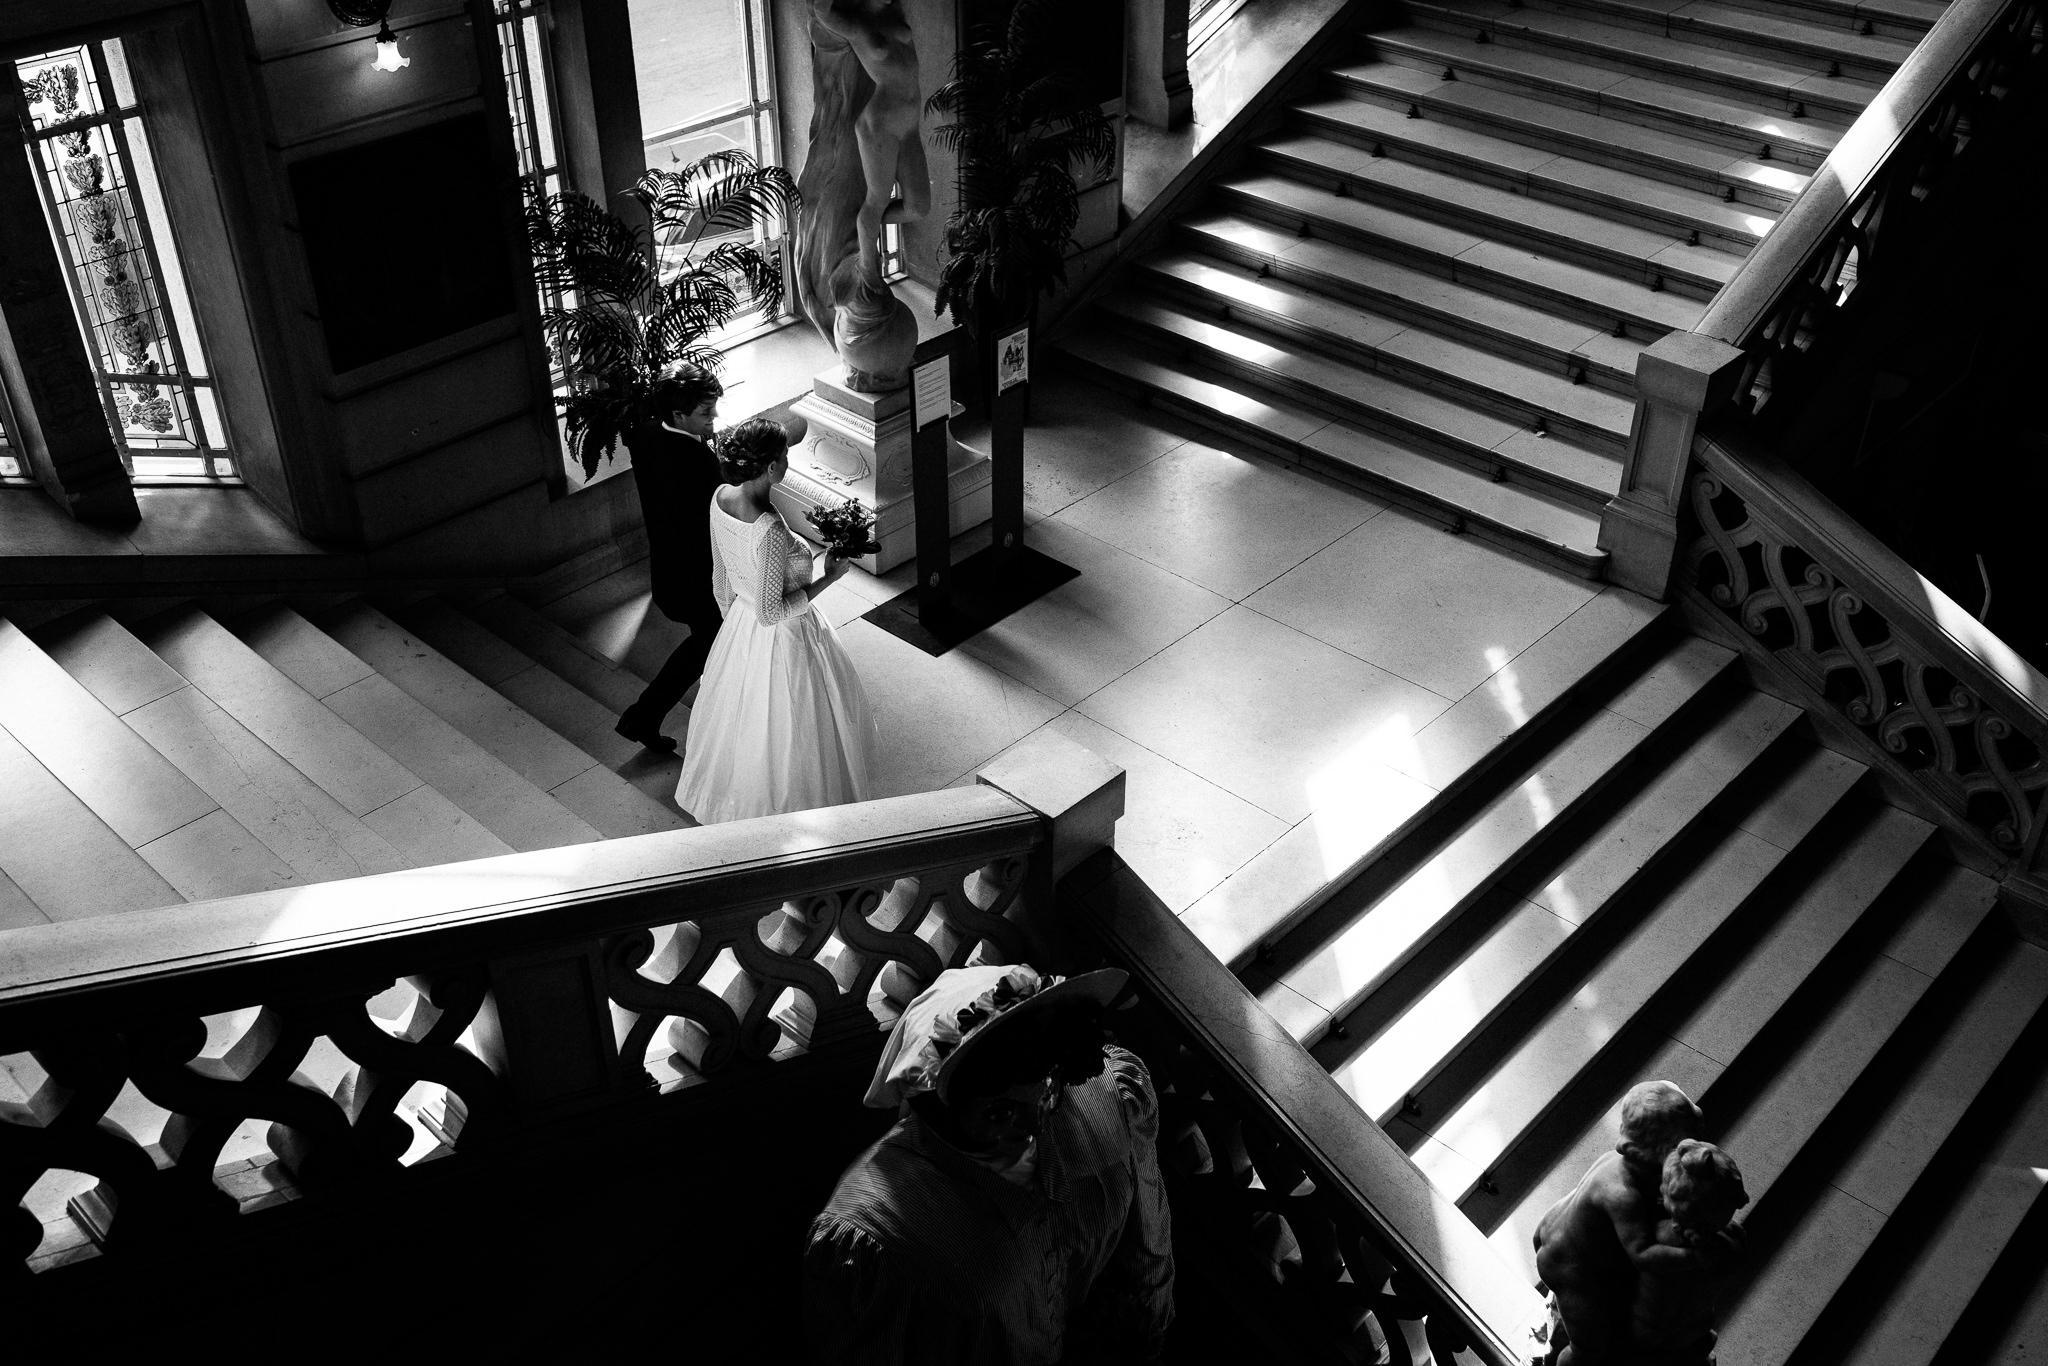 Wedding-Claudia&Philipp-15092018-small-83.jpg